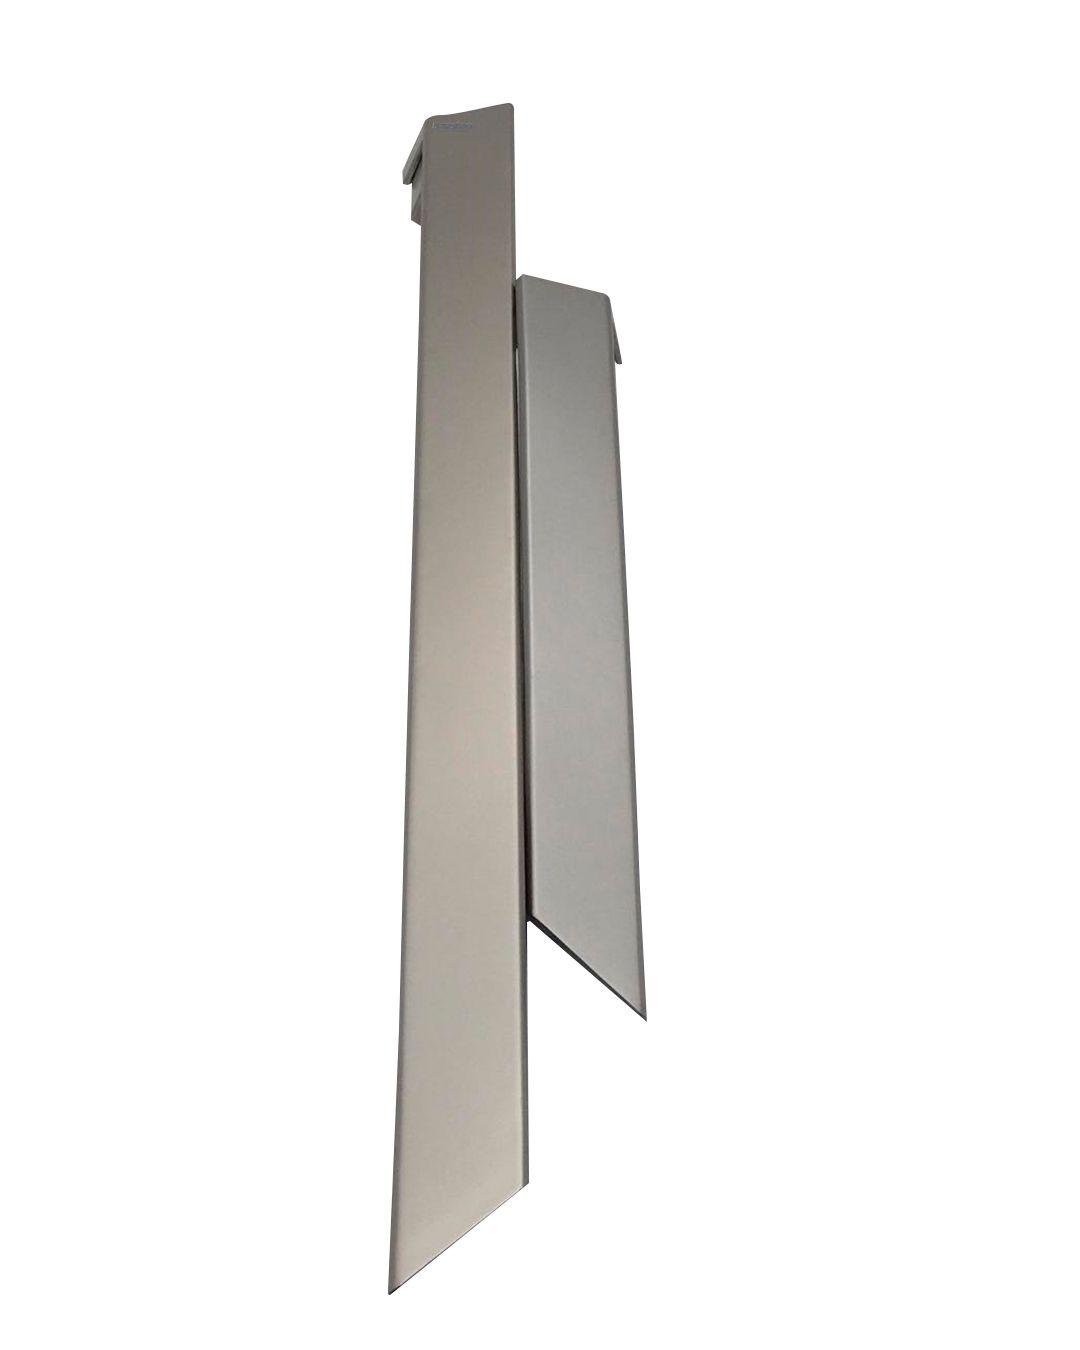 Kit Puxadores Refrigerador Rfge460 Rfge465 Rfge700 Rfge710